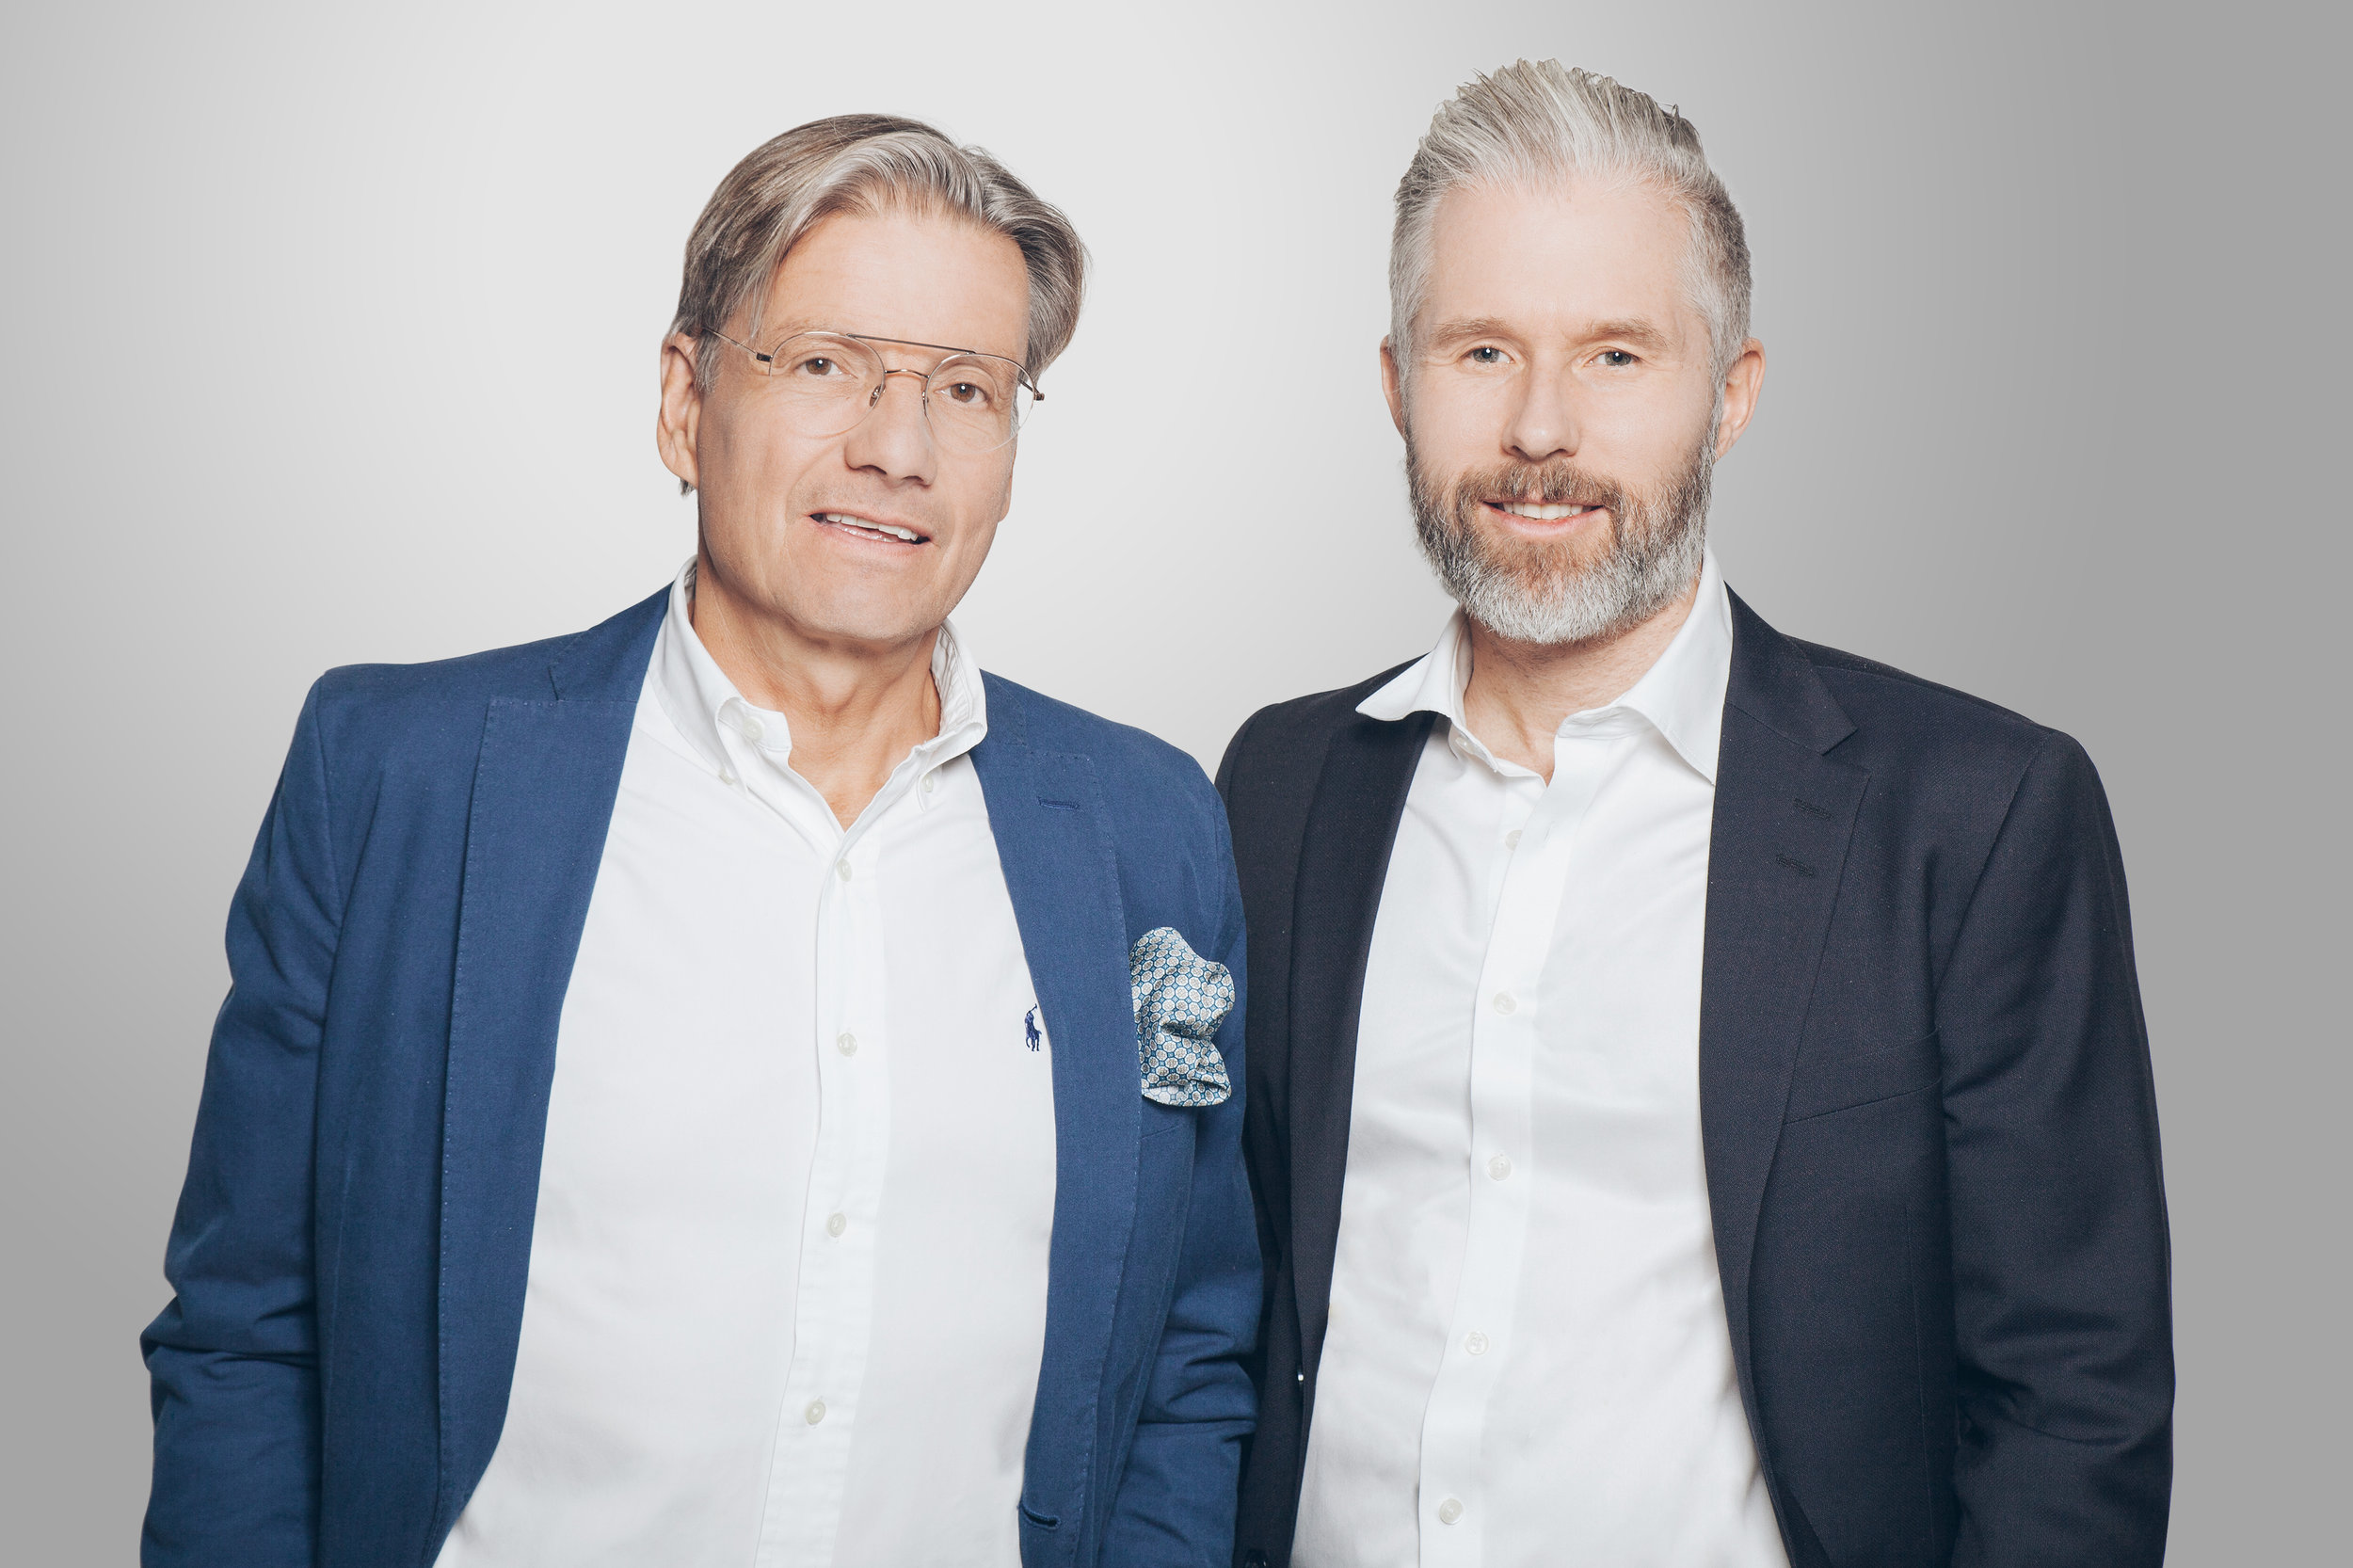 Ove Fondberg & Patrik Wincent - Fondberg & Wincent